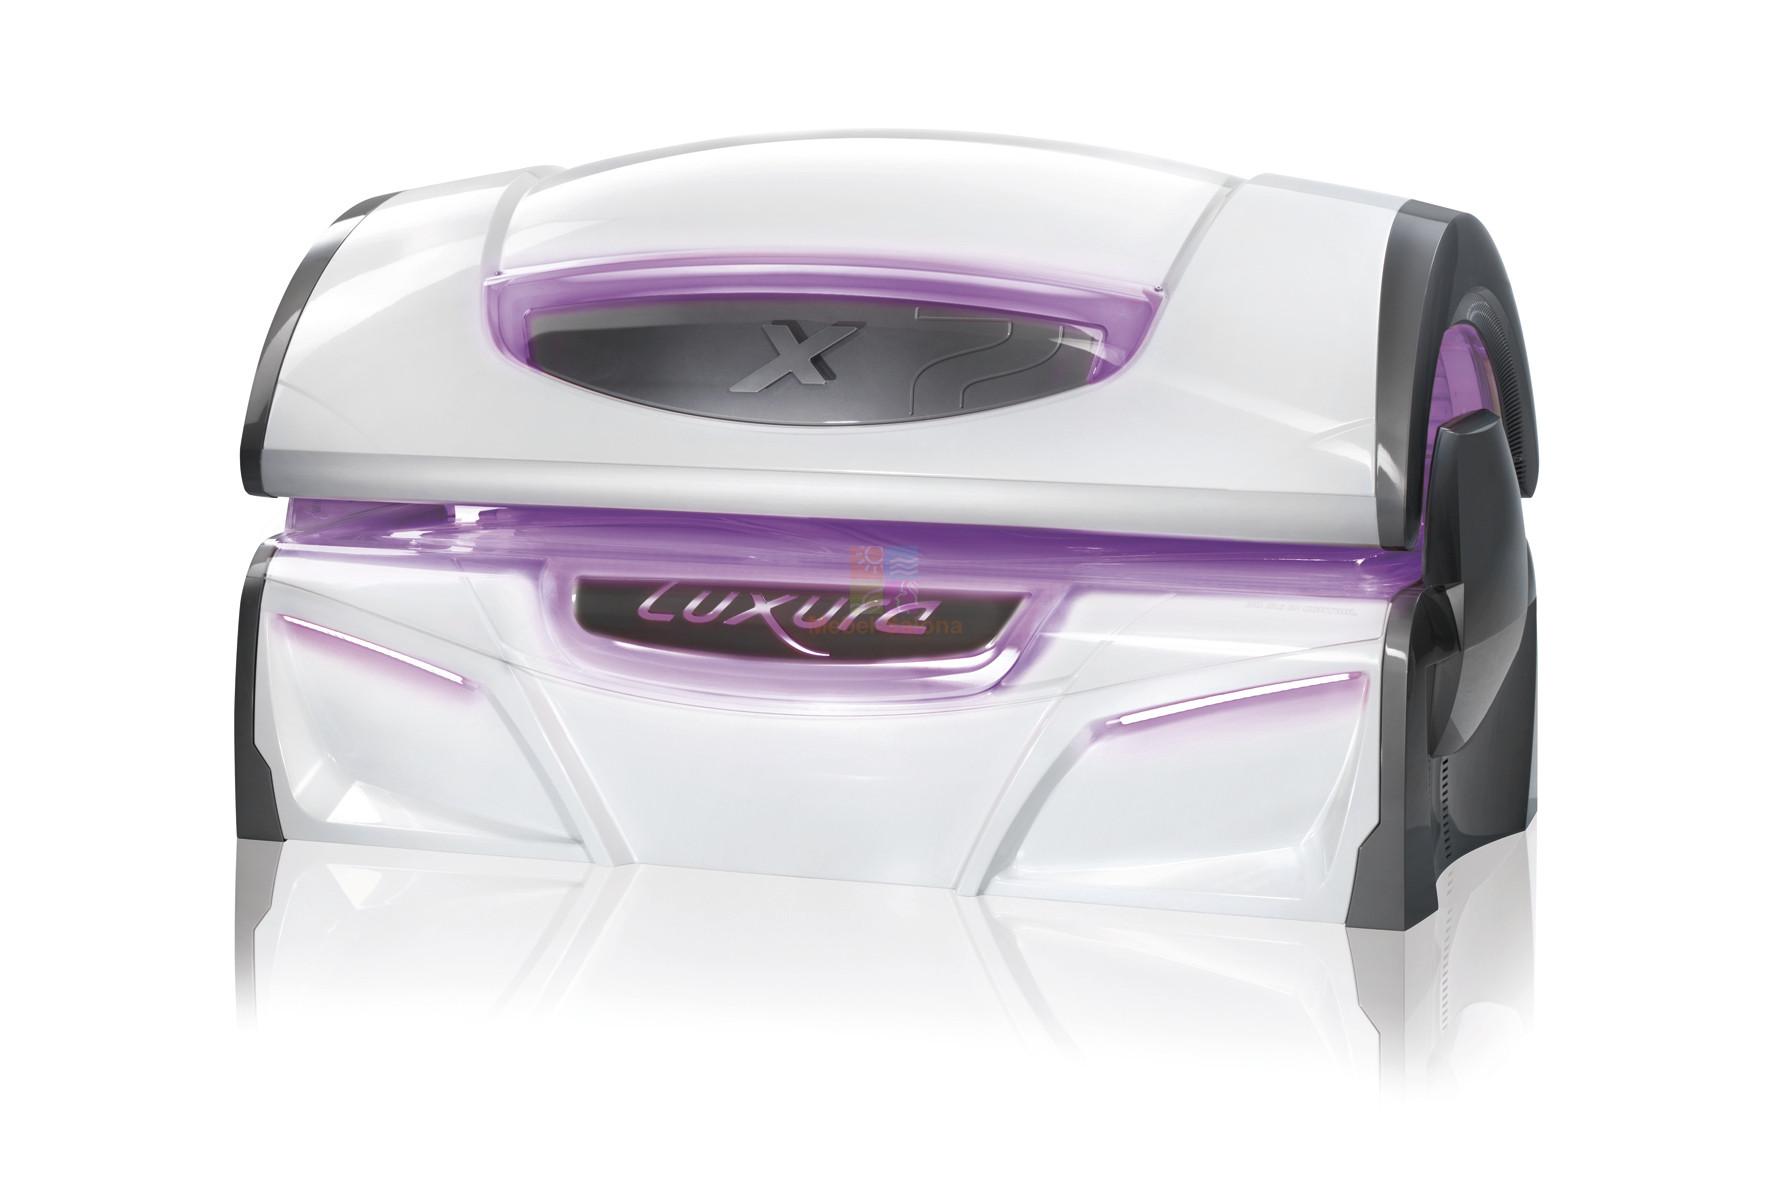 Cолярий горизонтальный Hapro Luxura X7 II 42 Sli High Intensive ультрамарин<br>